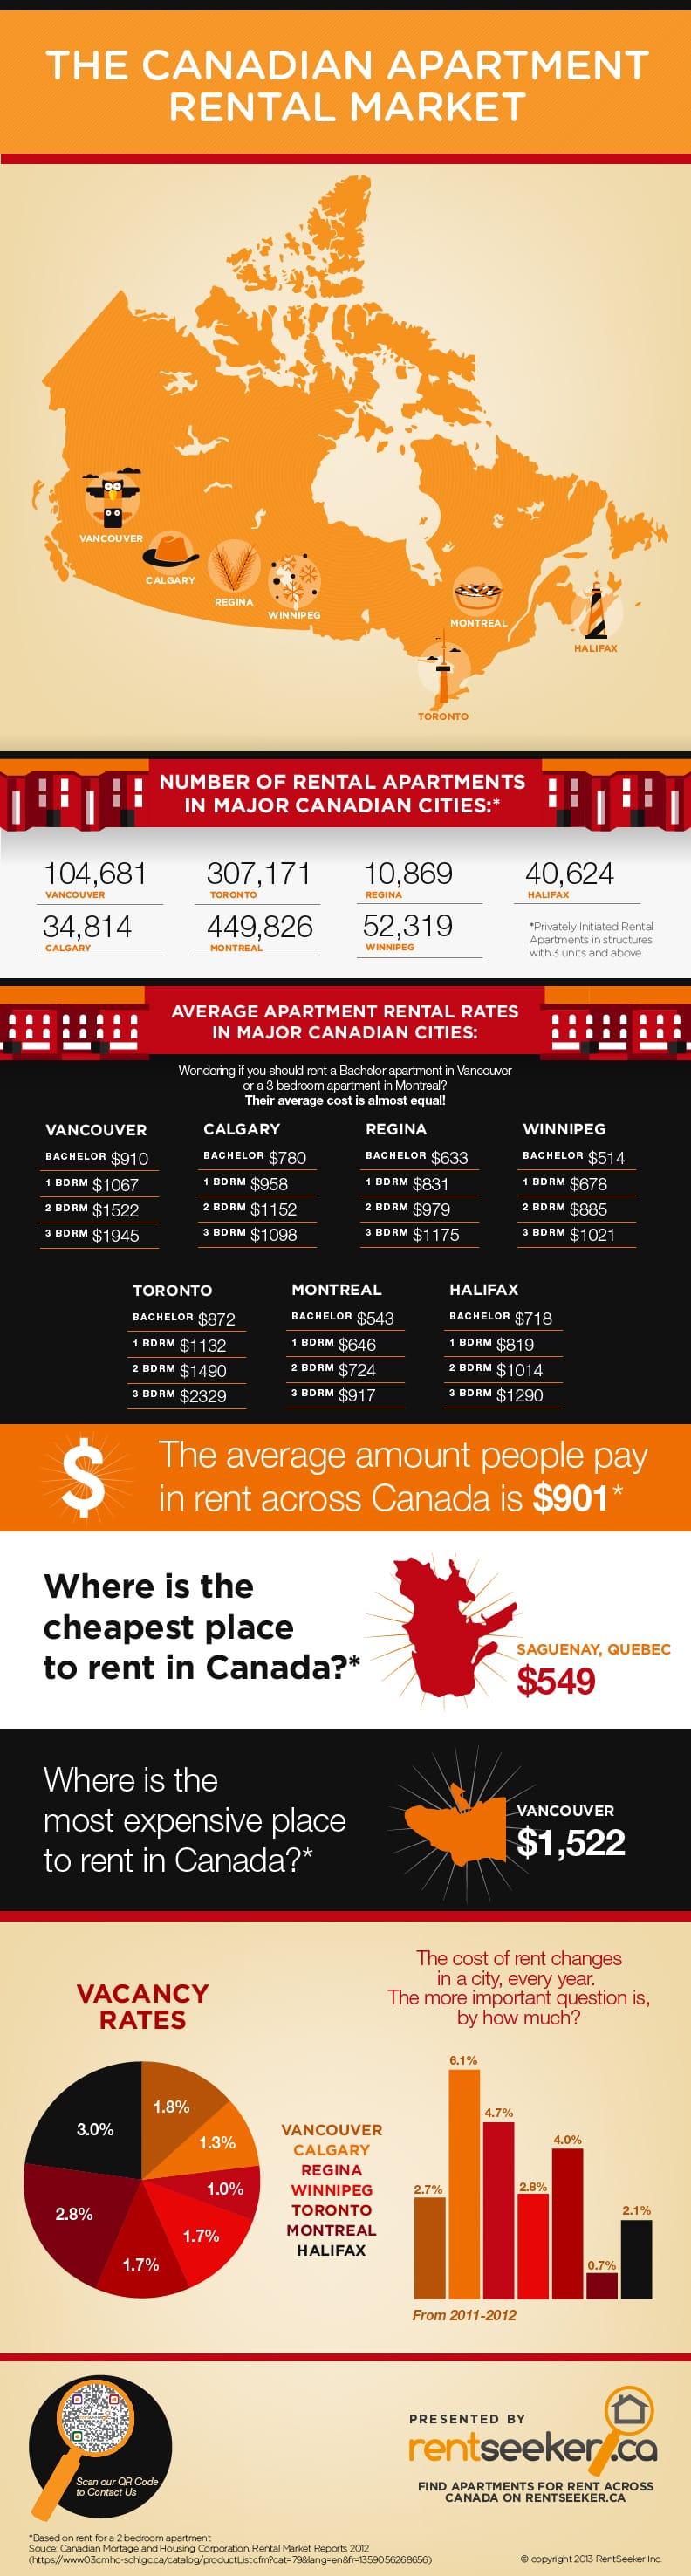 Canadian Rental Market Infographics presented by RentSeeker.ca